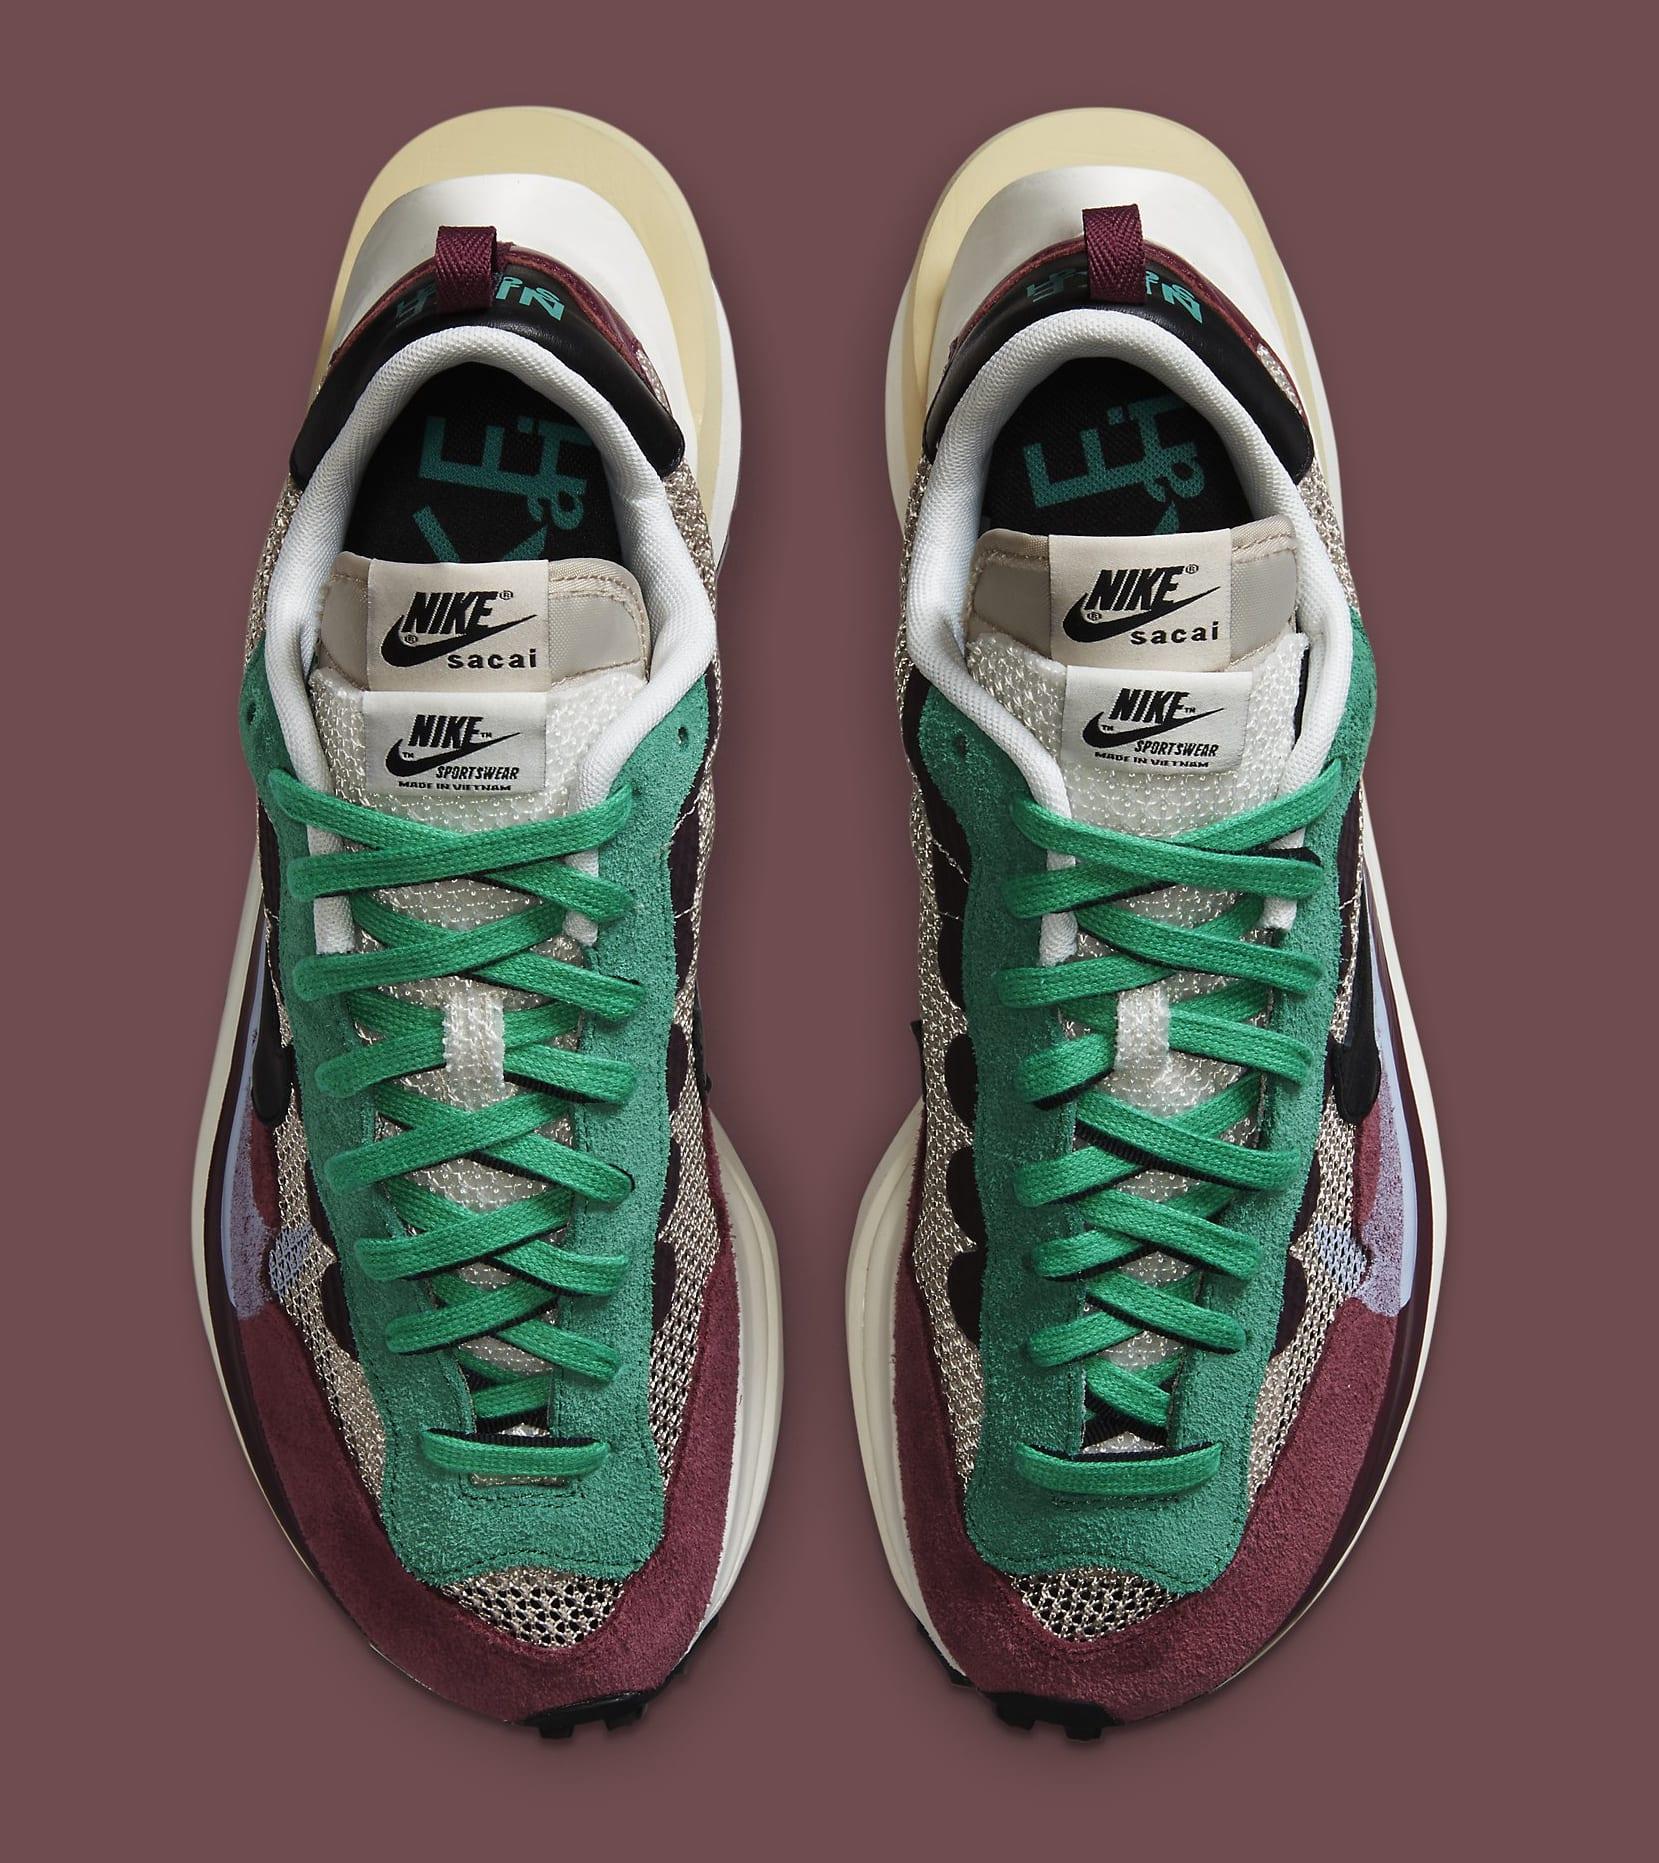 Sacai x Nike VaporWaffle 'Villain Red' DD3035-200 Top